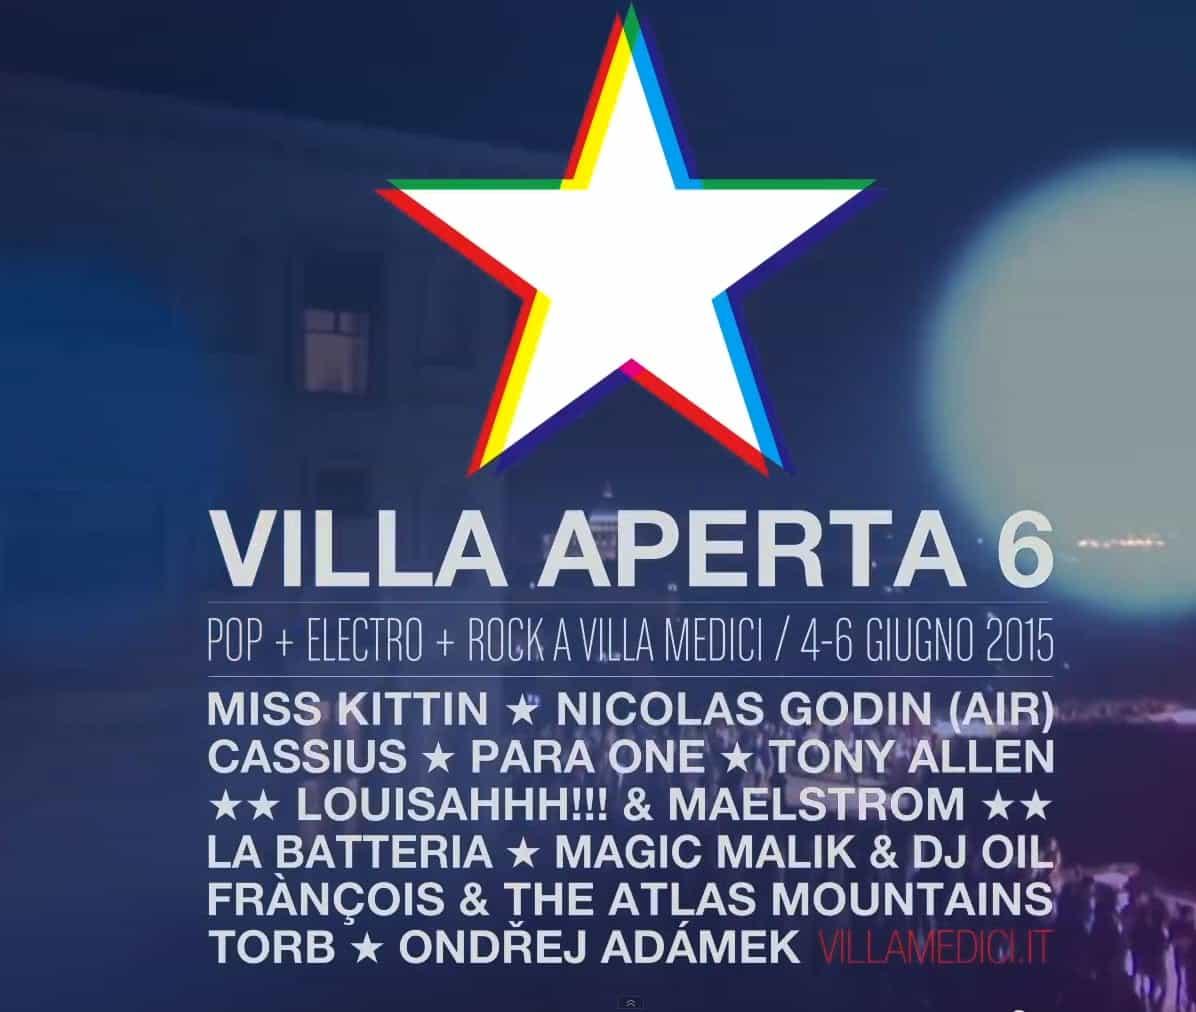 Villa Aperta : Le Festival Electro de la Villa Medici